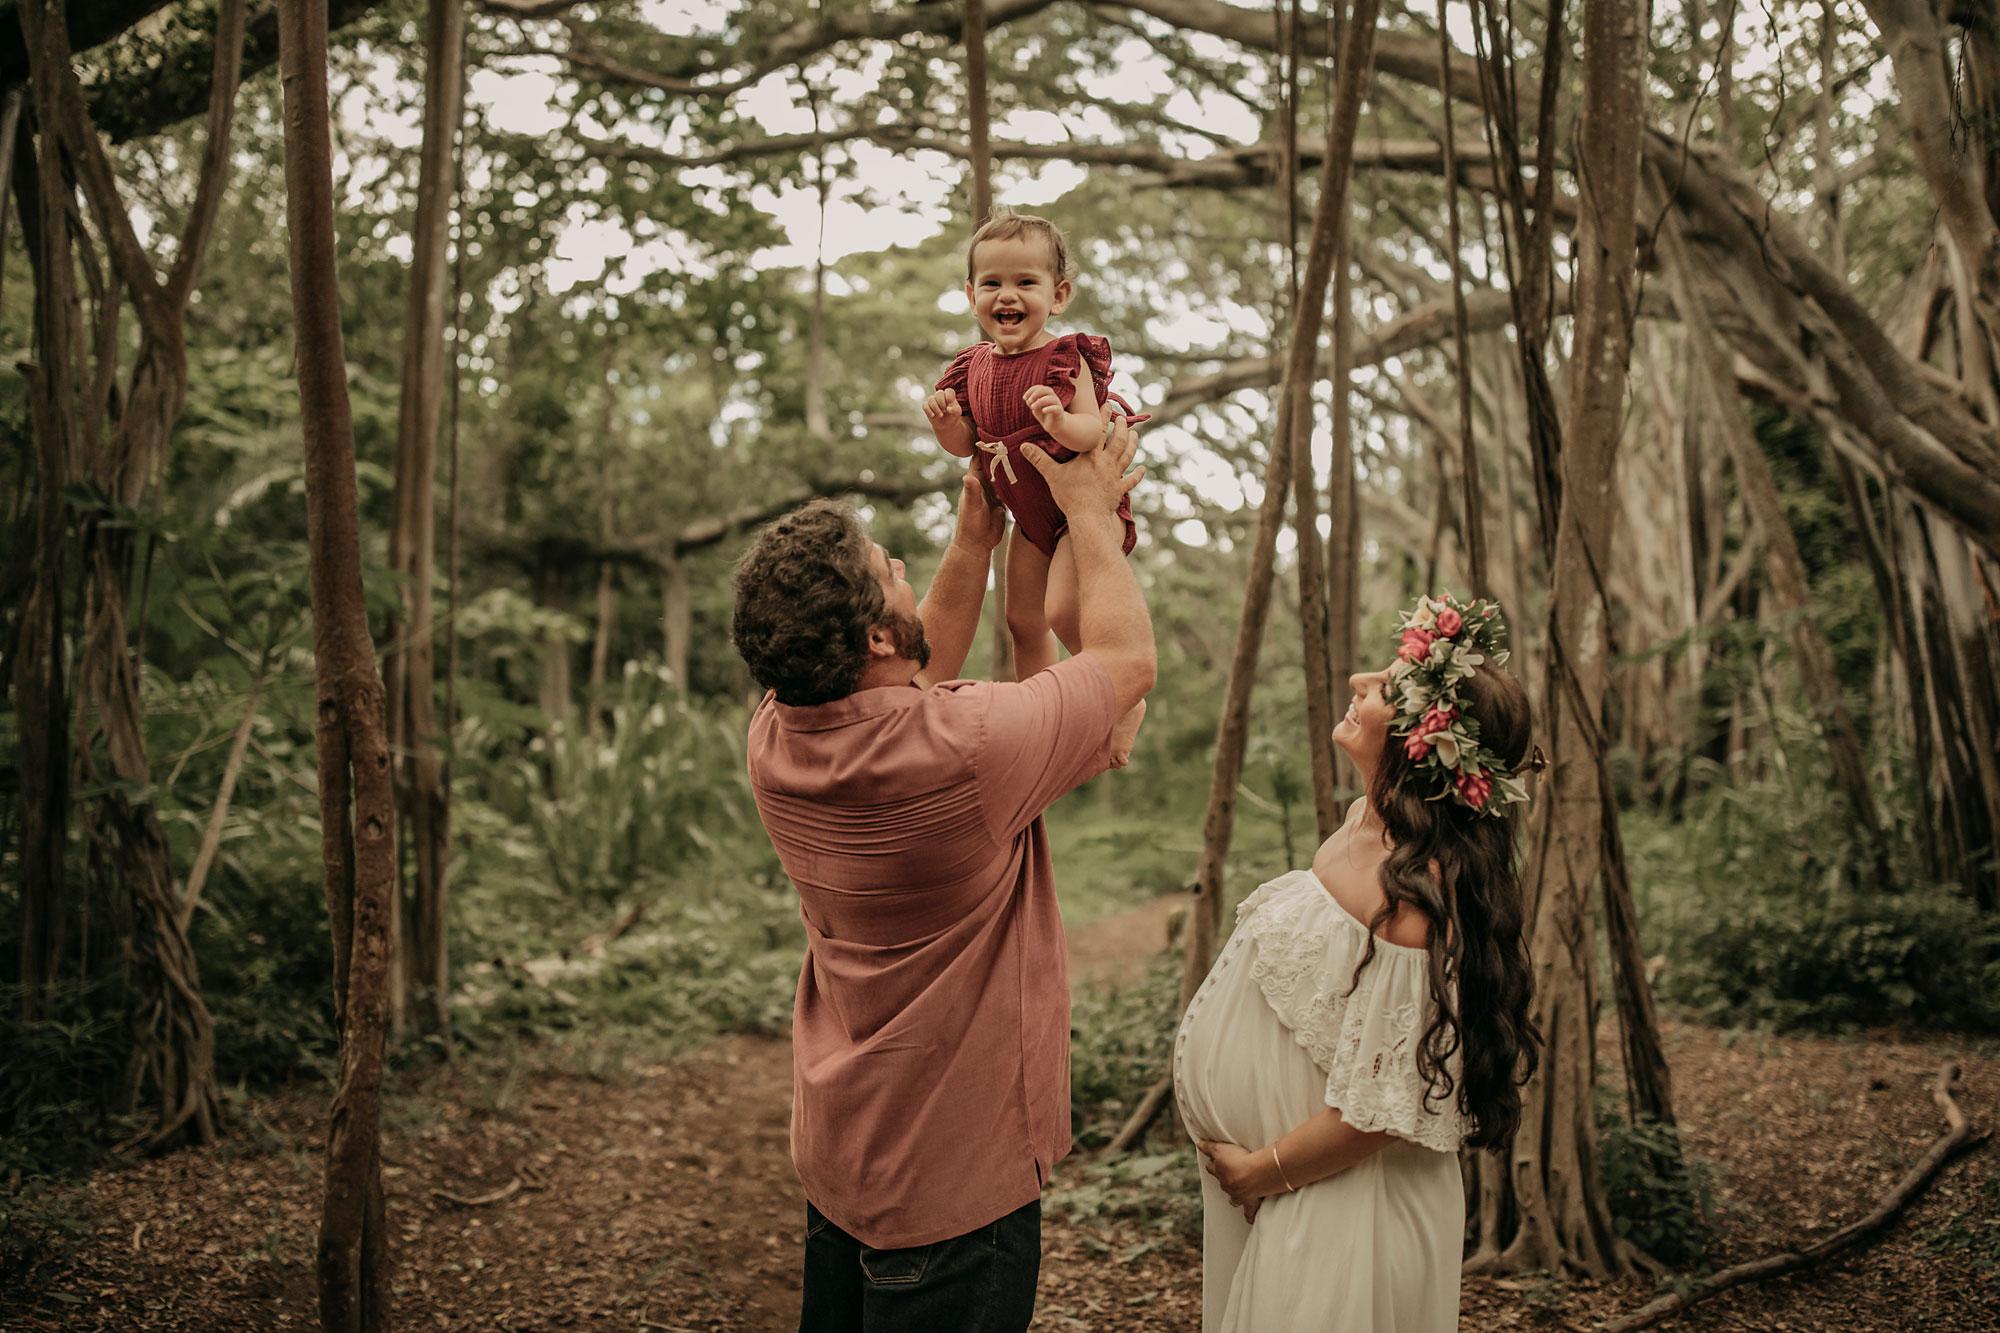 Hawaii-Oahu-Maternity-Photography-The-Sophia-Co-004.jpg